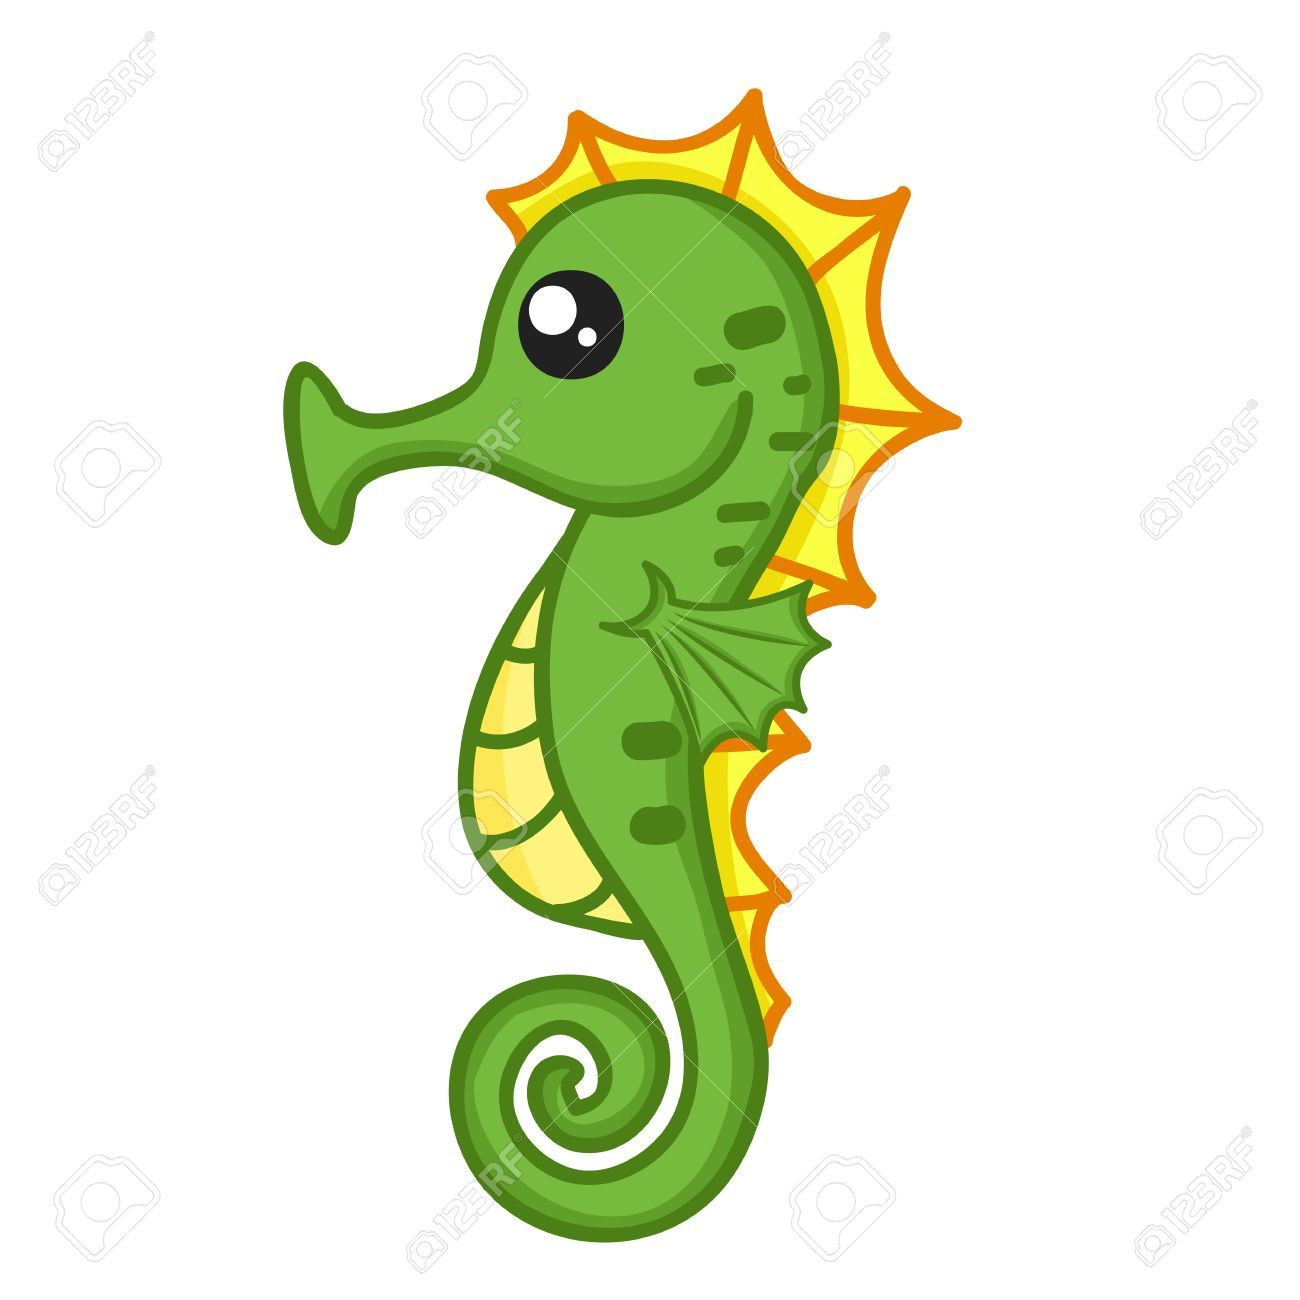 Sea horse clipart cute banner royalty free download Cute Seahorse Clipart #1 | Cool rock ideas! | Seahorse ... banner royalty free download